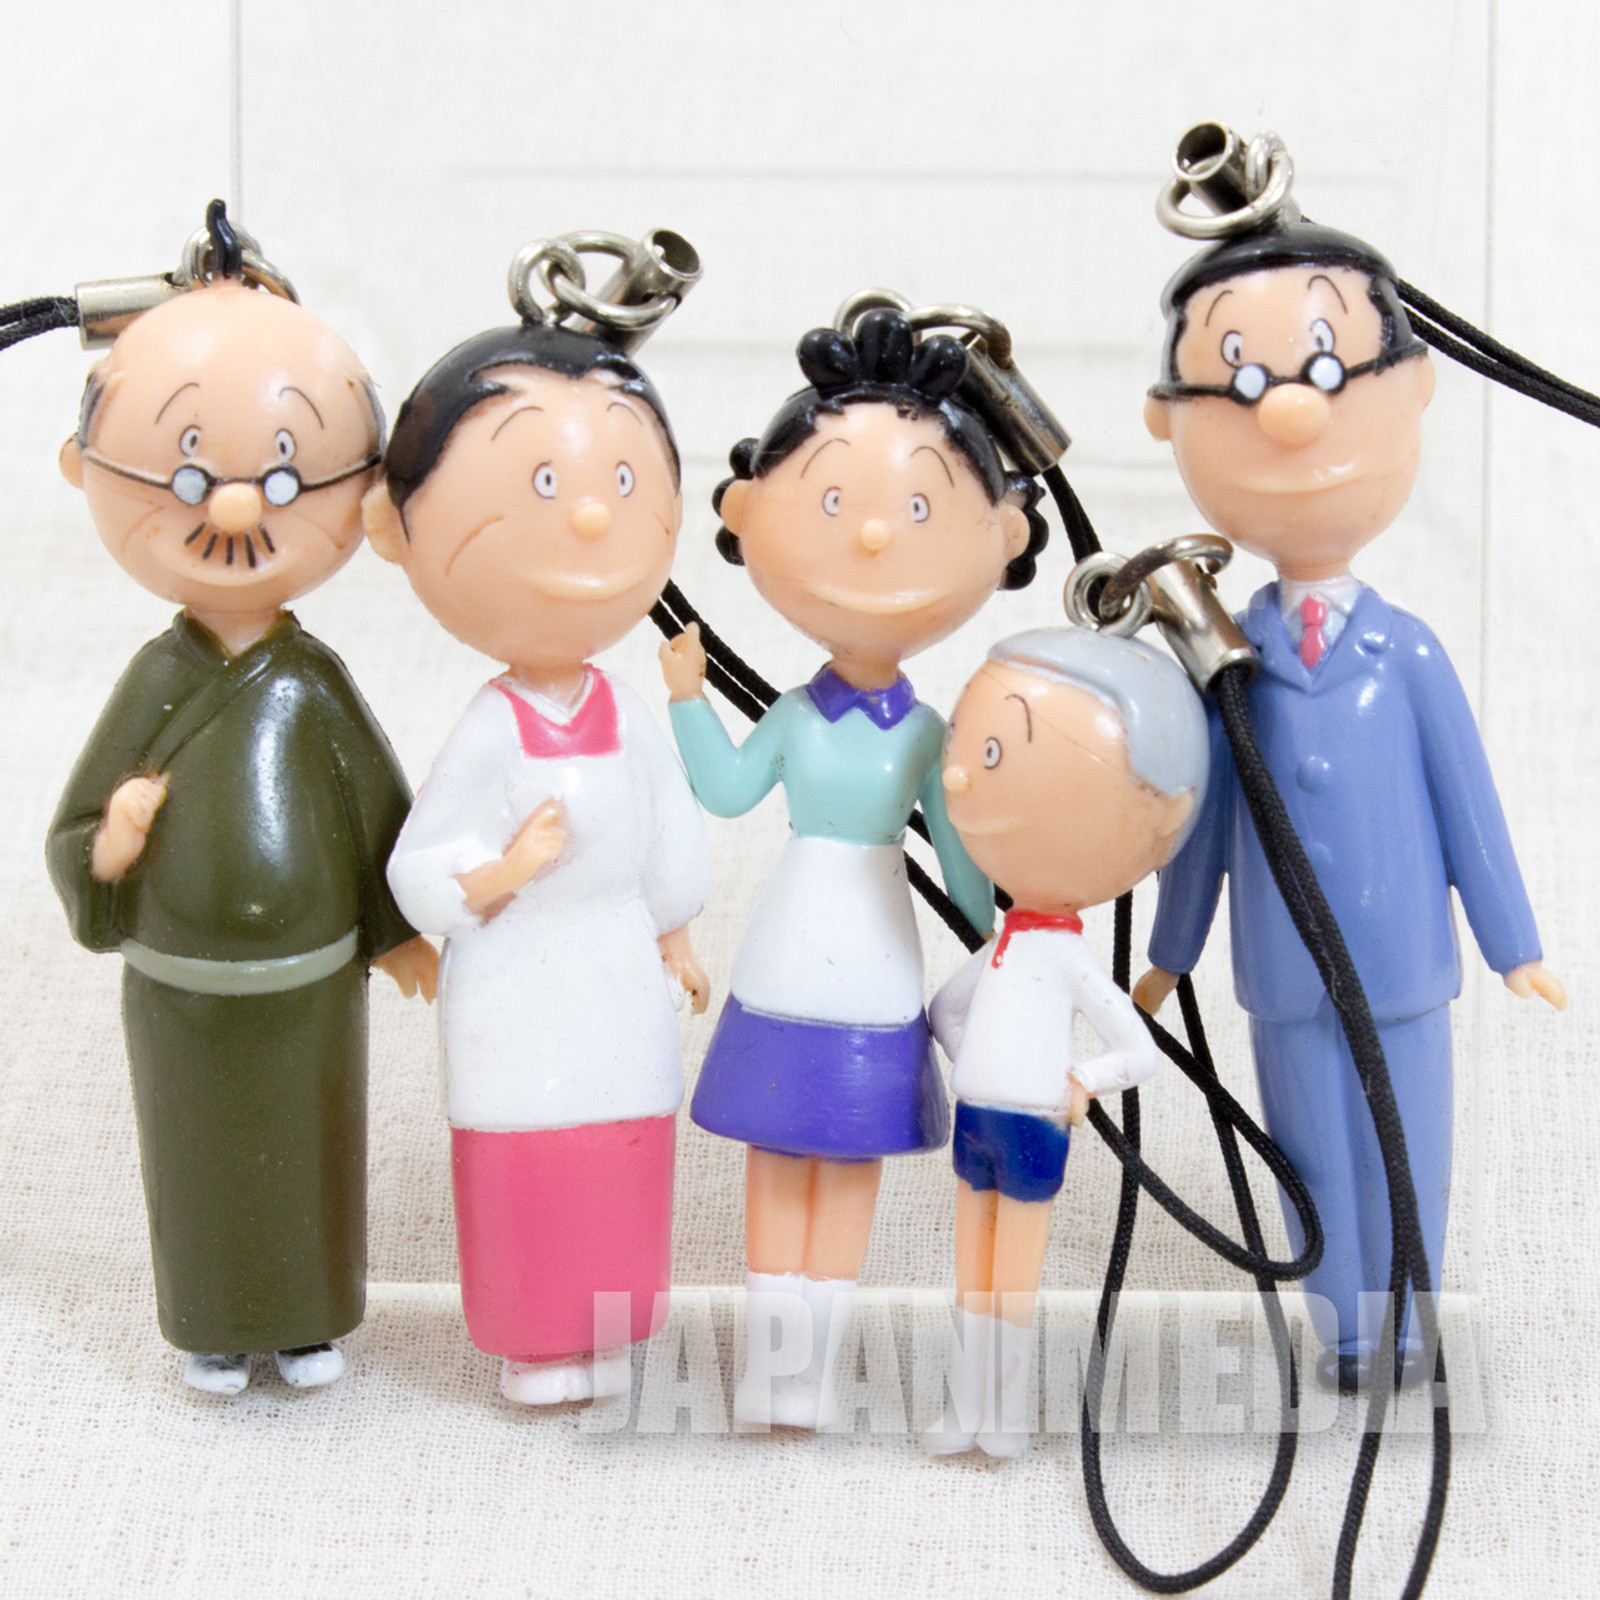 RARE! Sazae-san Mascot Figure Strap 5pc Set Sazae Katsuo Namihei Masuo Fune